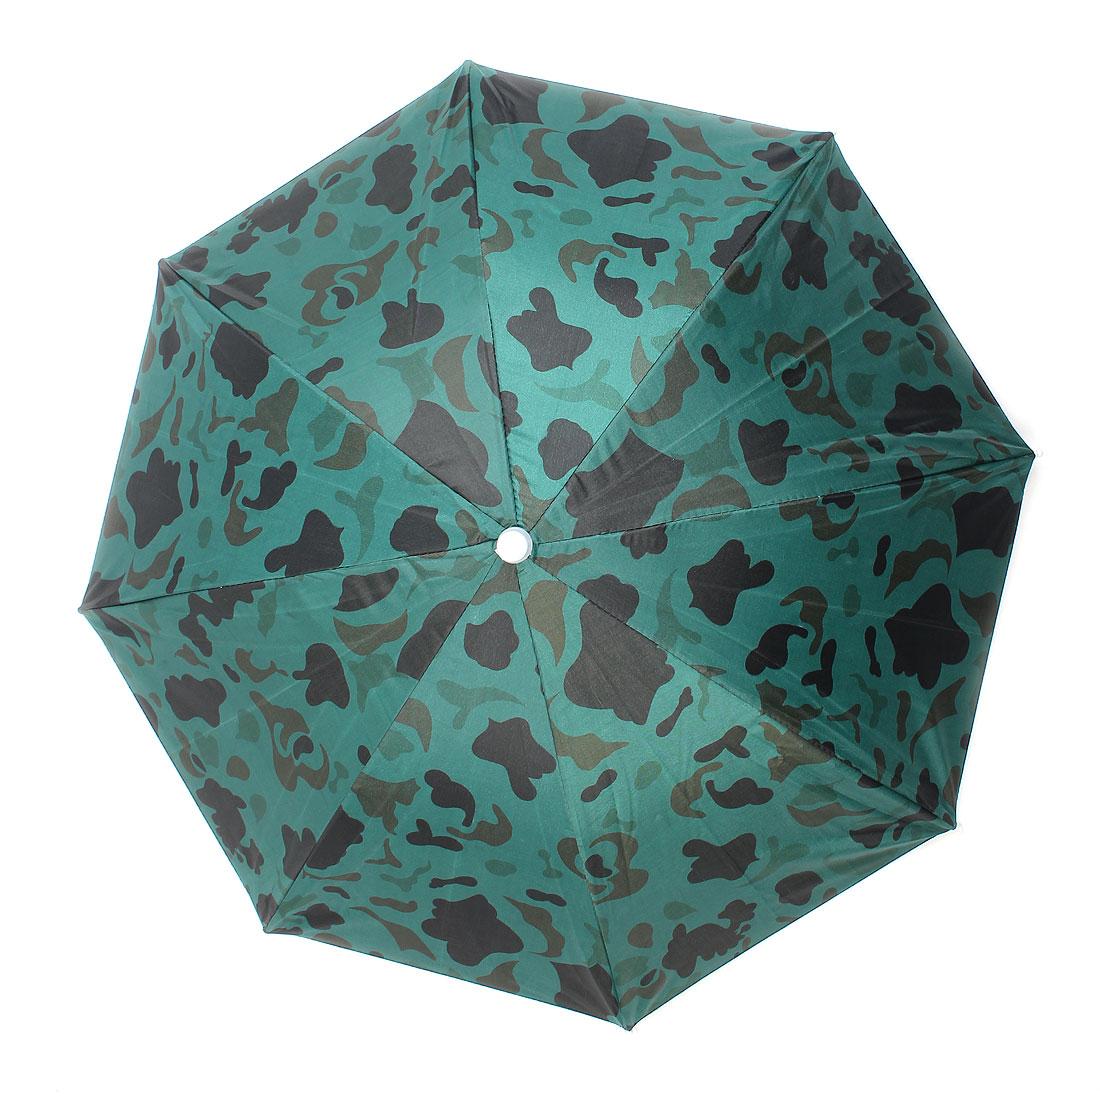 Online kopen wholesale paraplu luifel uit china paraplu luifel groothandel - Tent paraplu ...